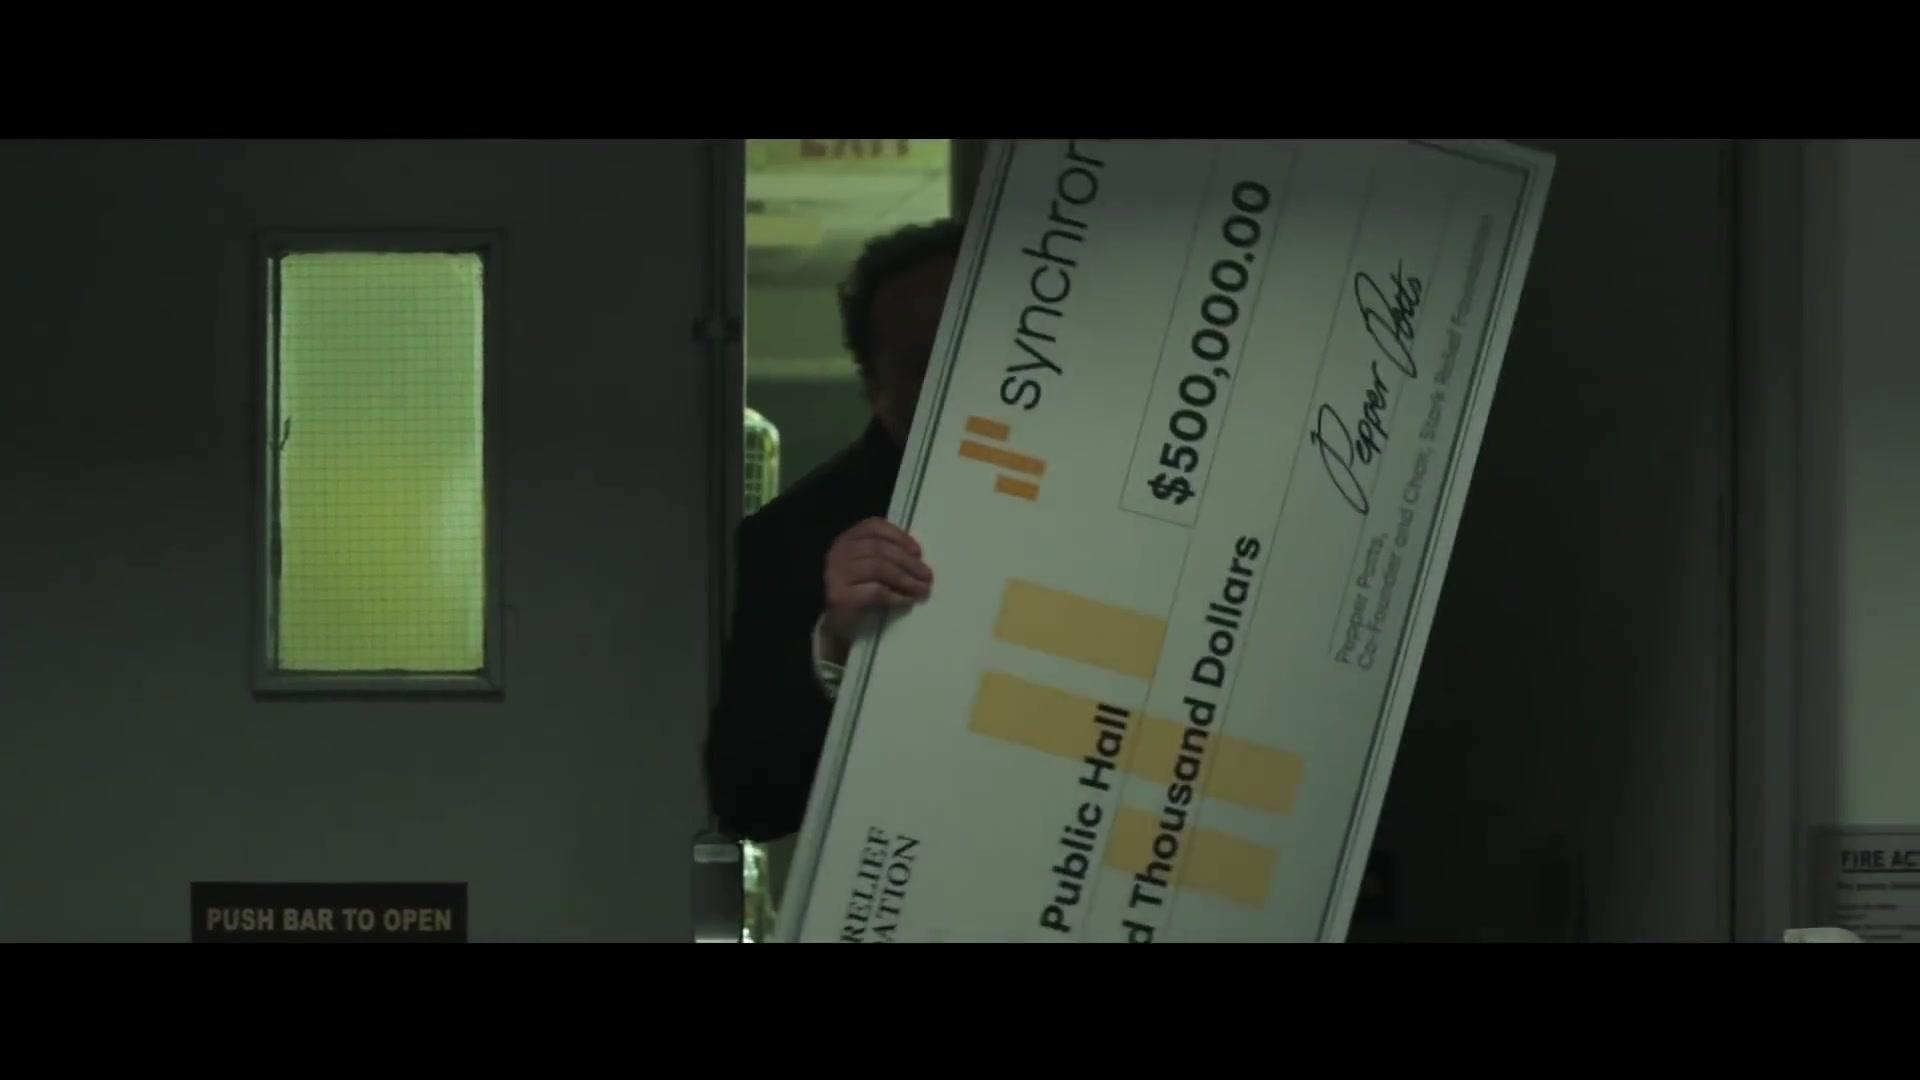 synchrony bank big check held by jon favreau in spider